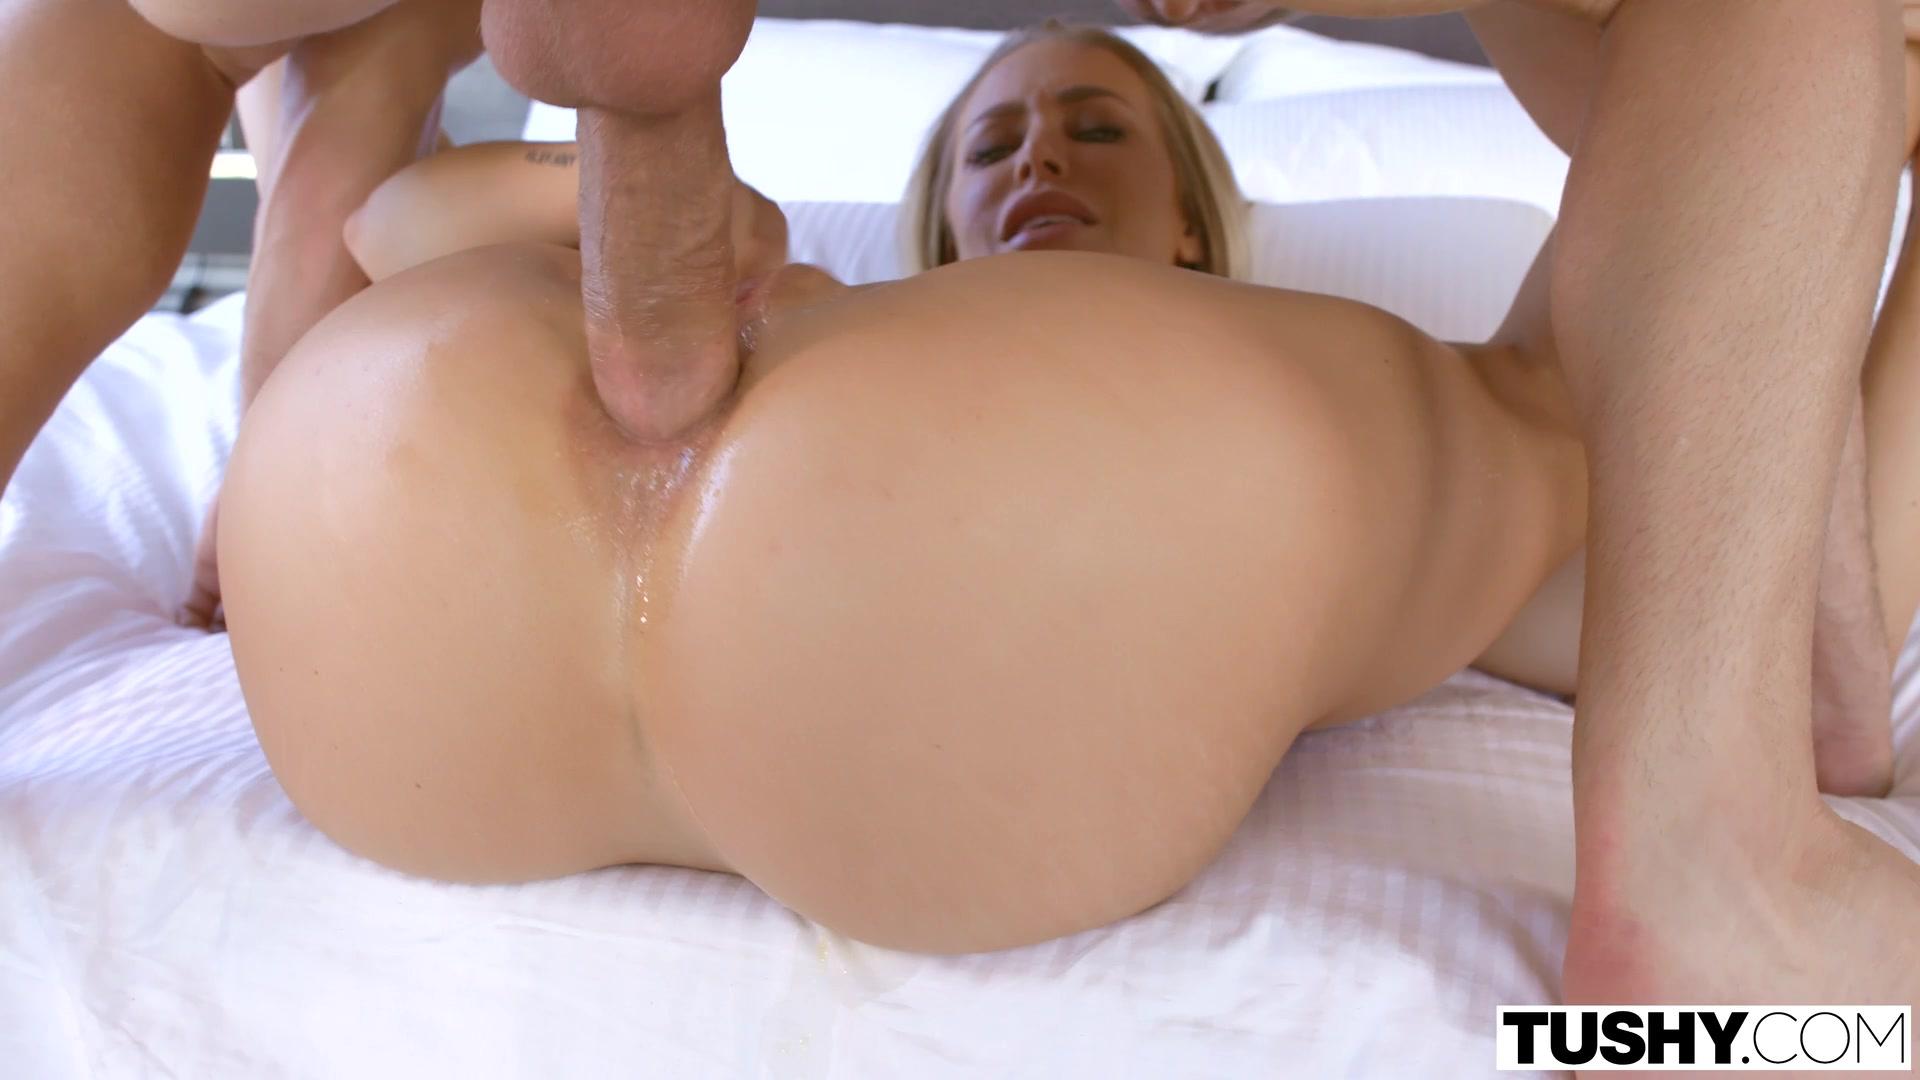 Hd busty anal